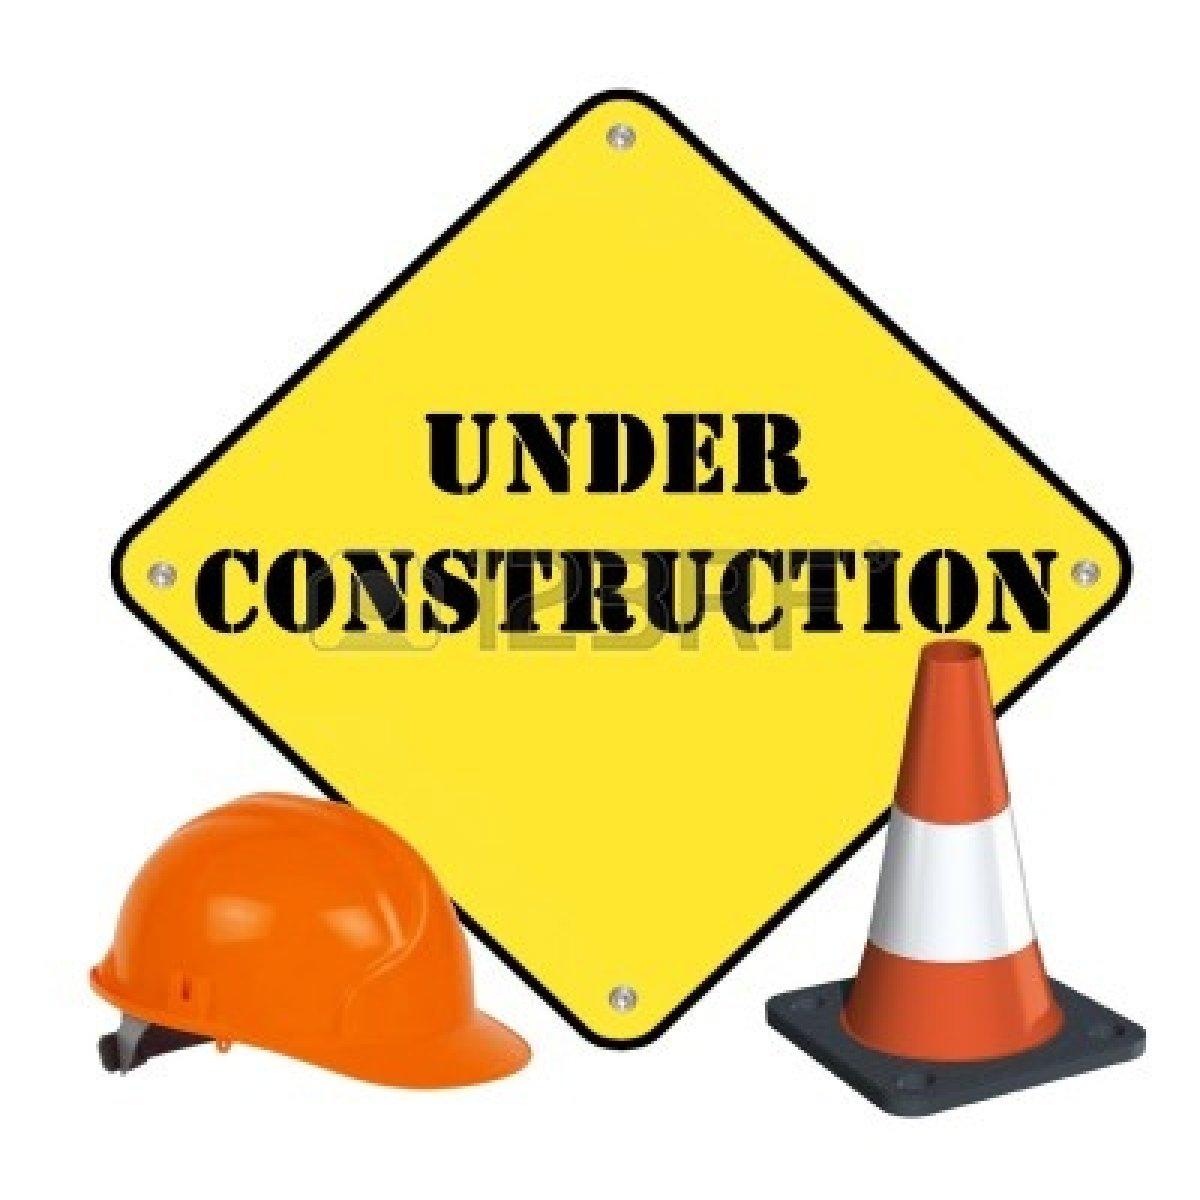 Free cliparts download clip. Contractor clipart construction zone